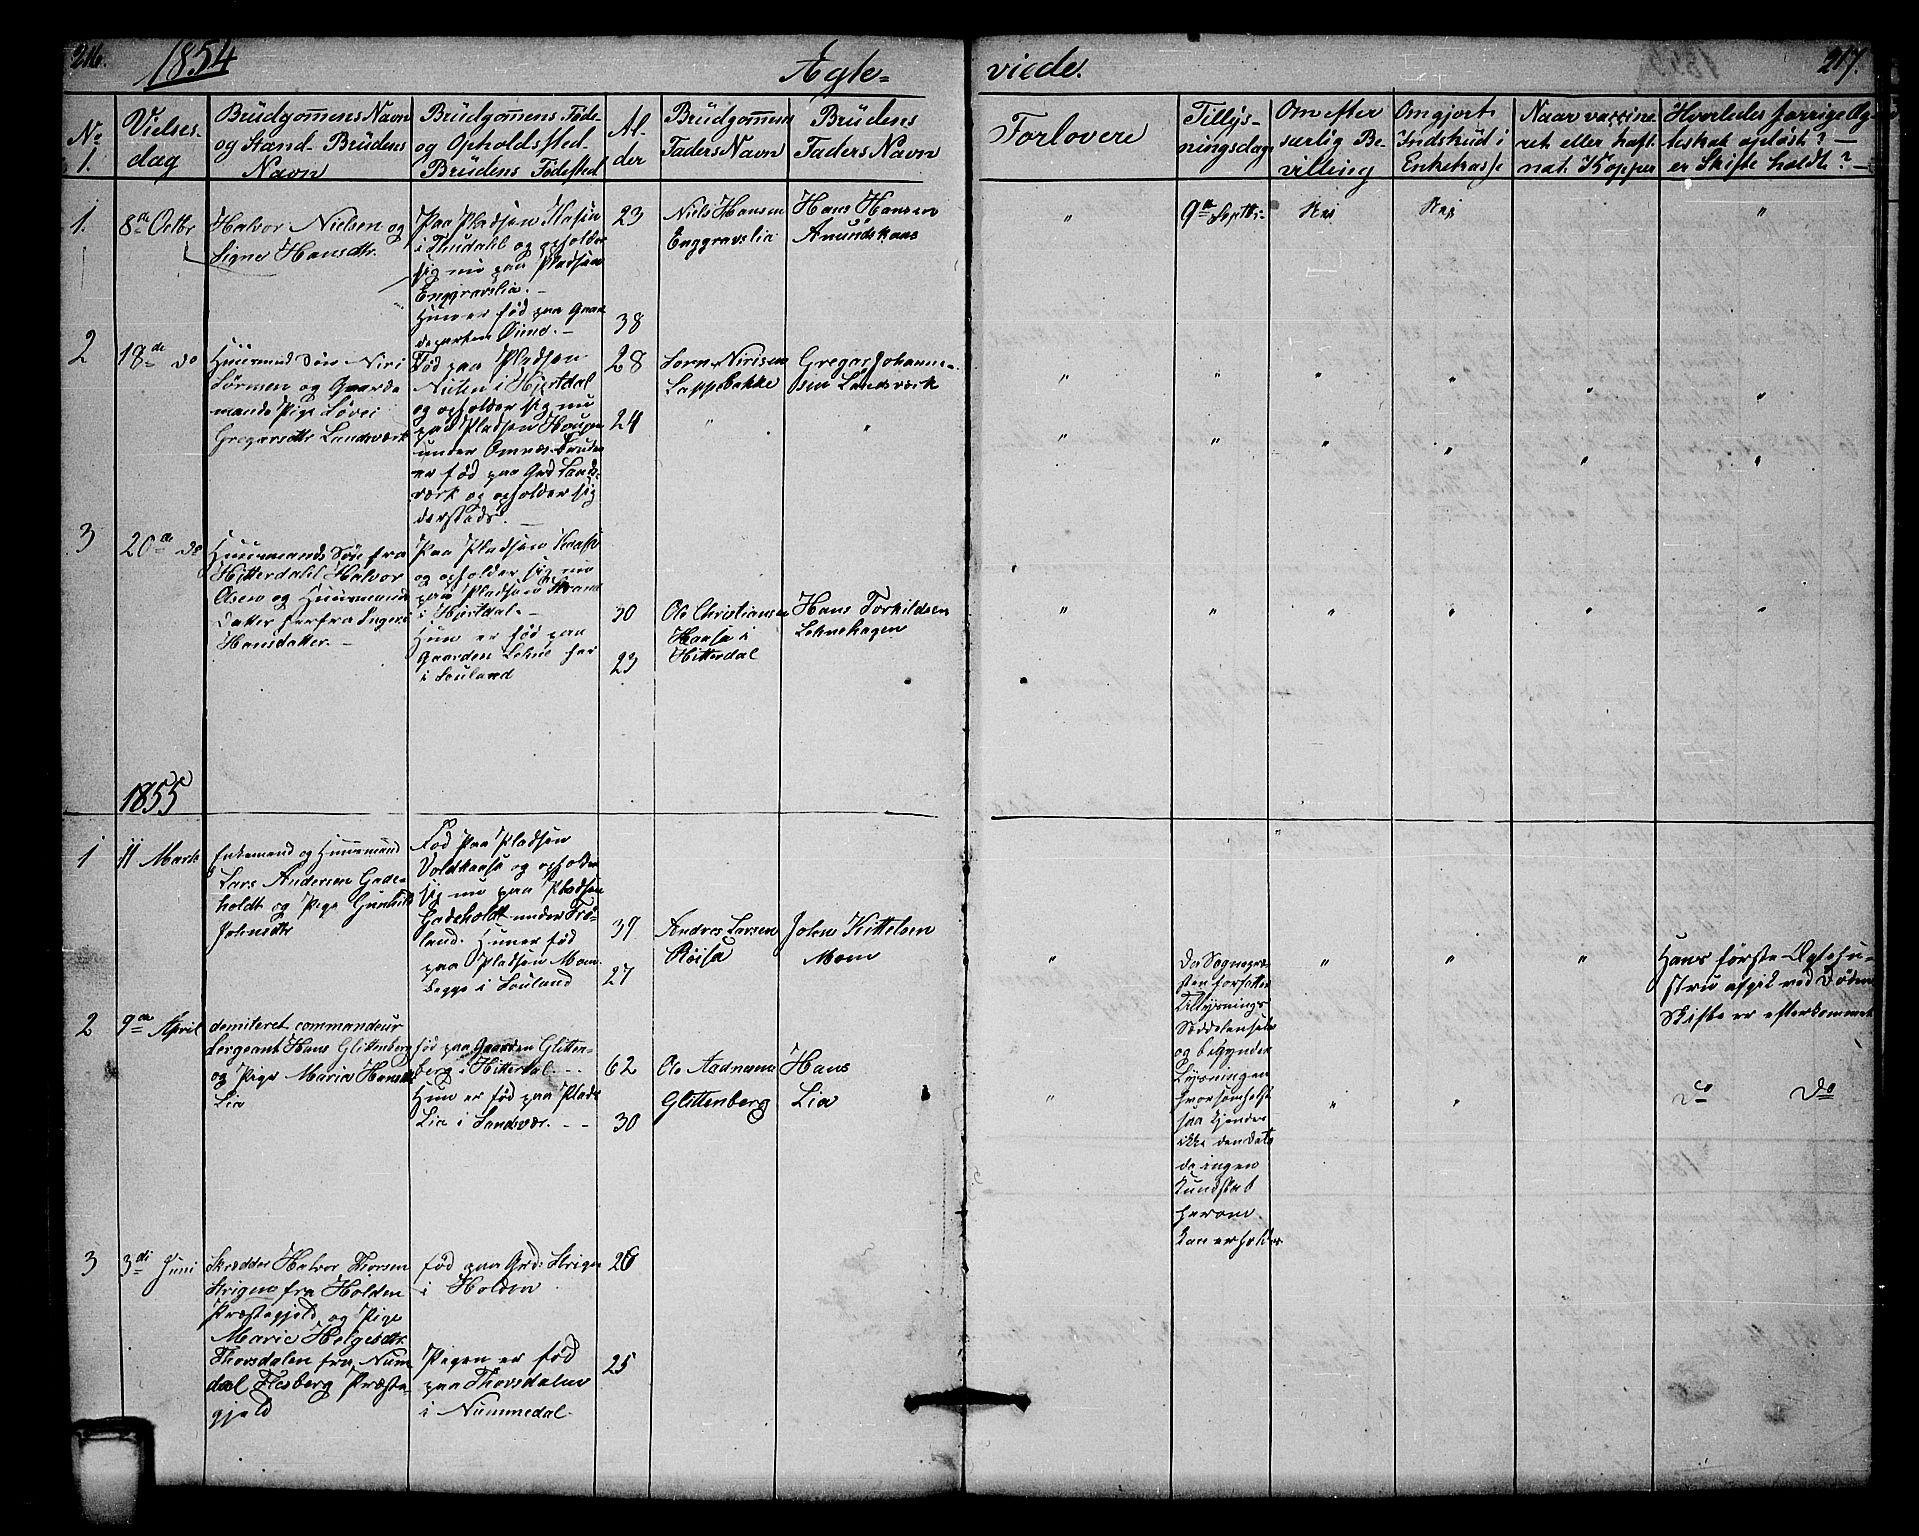 SAKO, Hjartdal kirkebøker, G/Gb/L0002: Klokkerbok nr. II 2, 1854-1884, s. 216-217